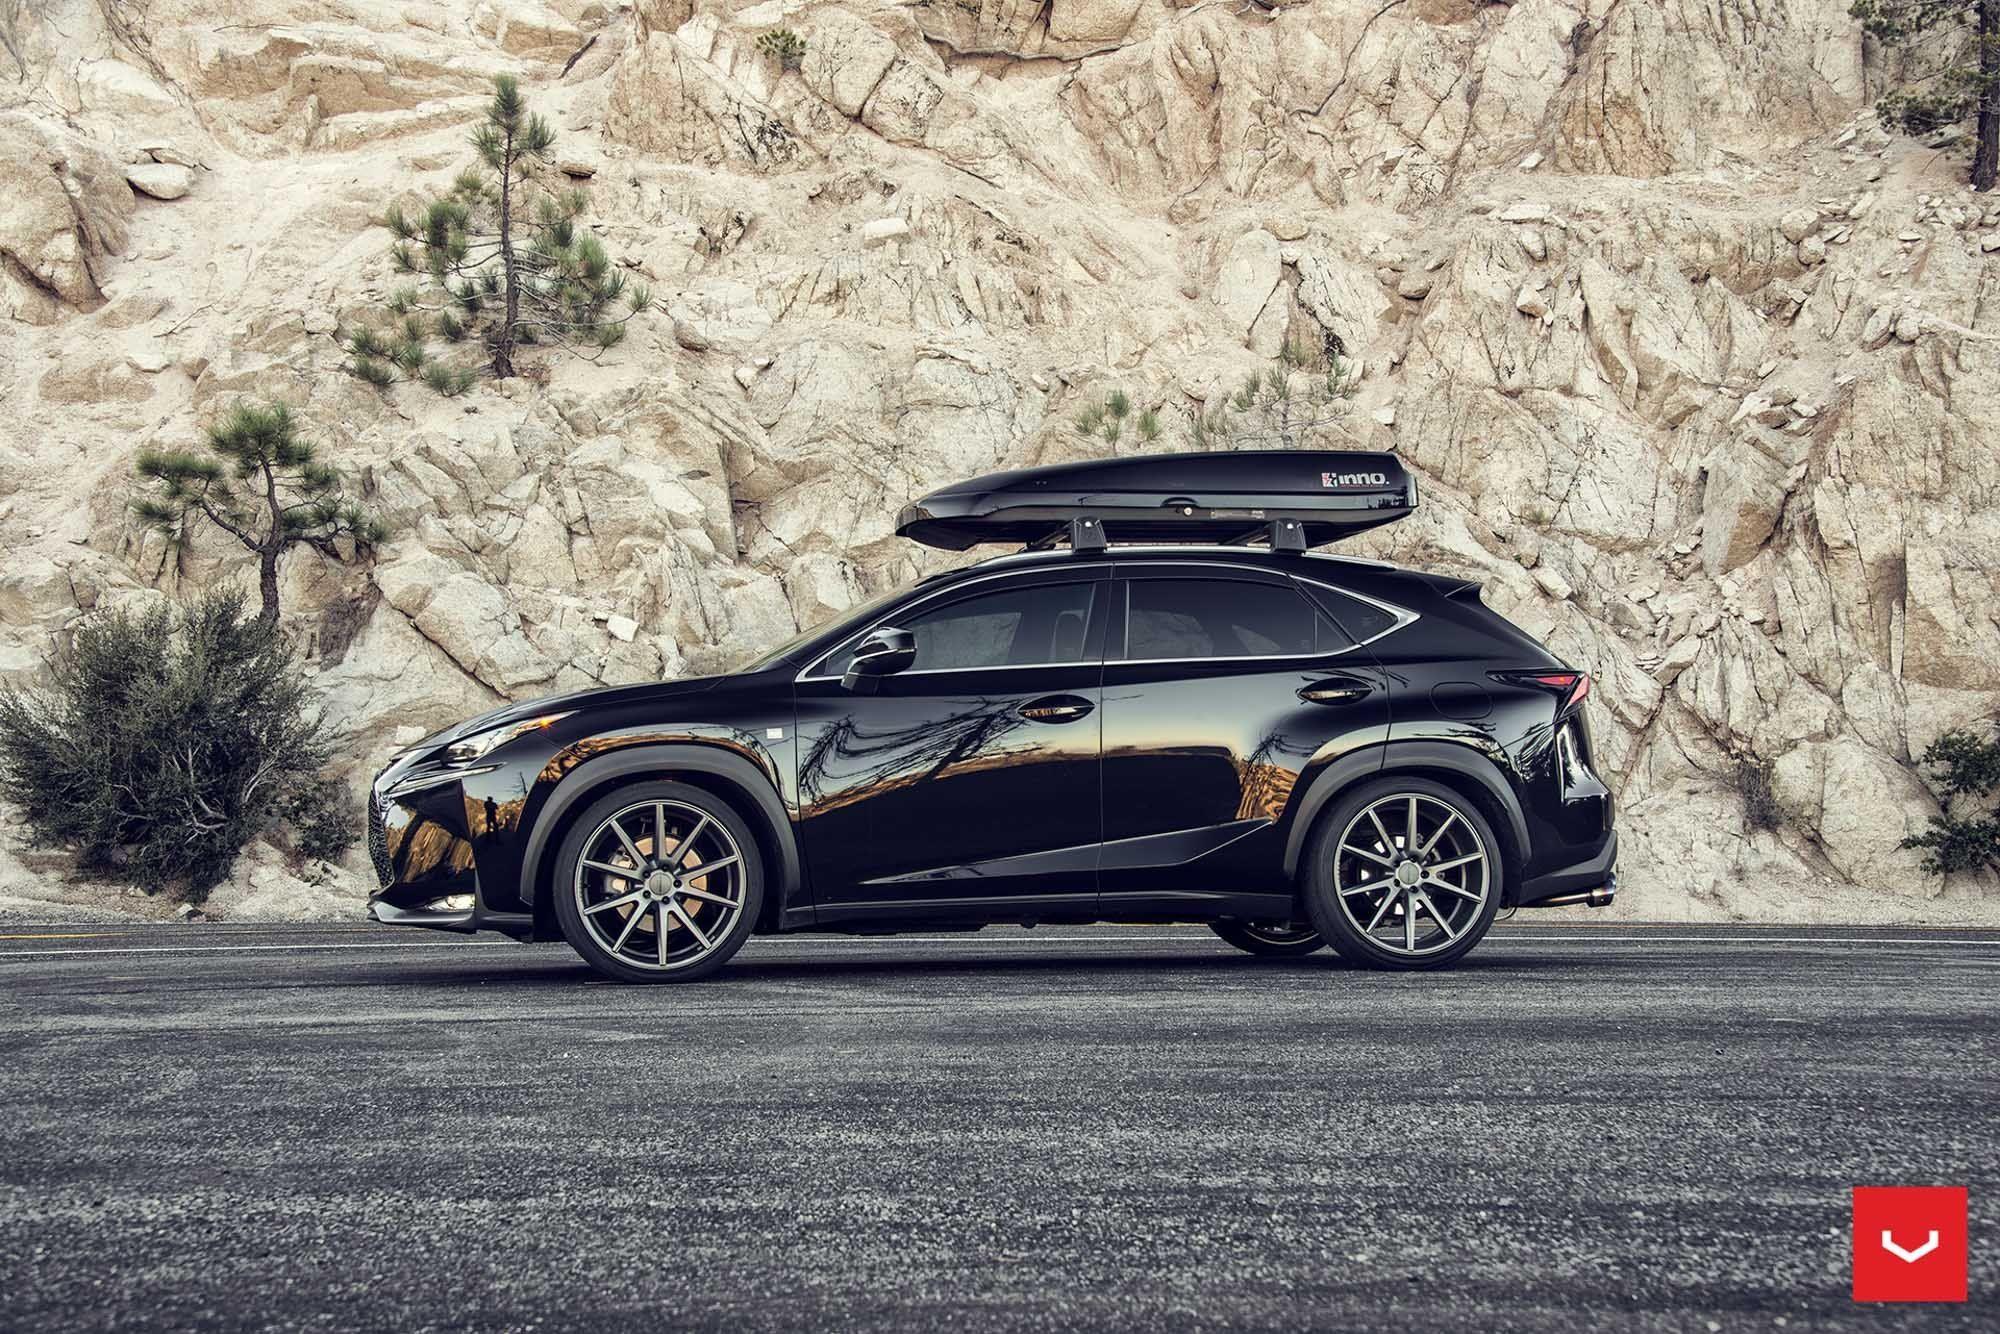 Vossen Vps 301 Custom Wheels On Black Lexus Nx200t Car Wheels Car Wheels Rims Car Wheels Diy